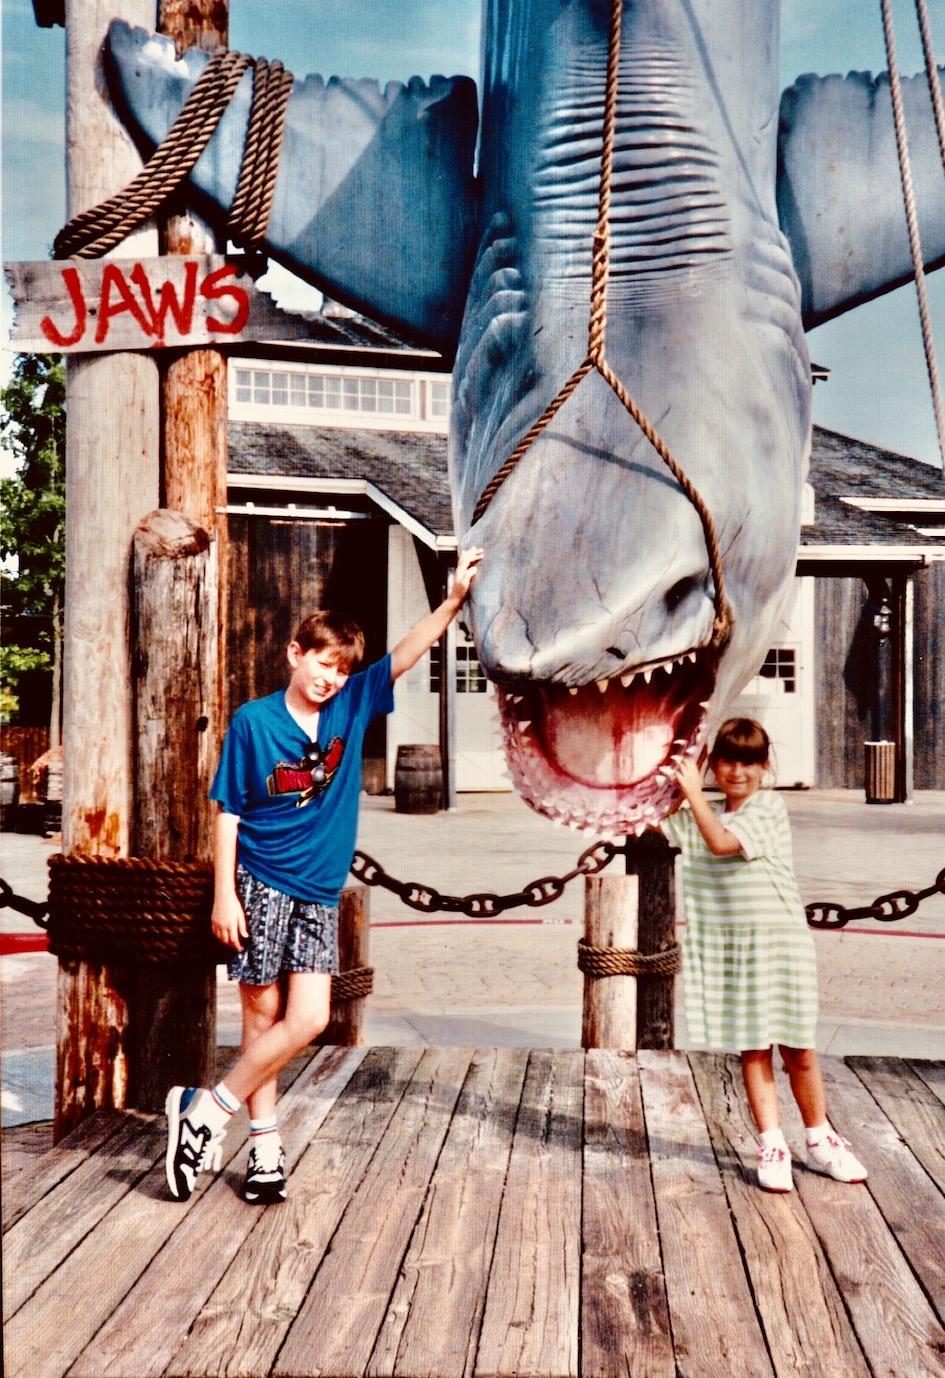 Jaws The Ride Universal Studios Florida 1991